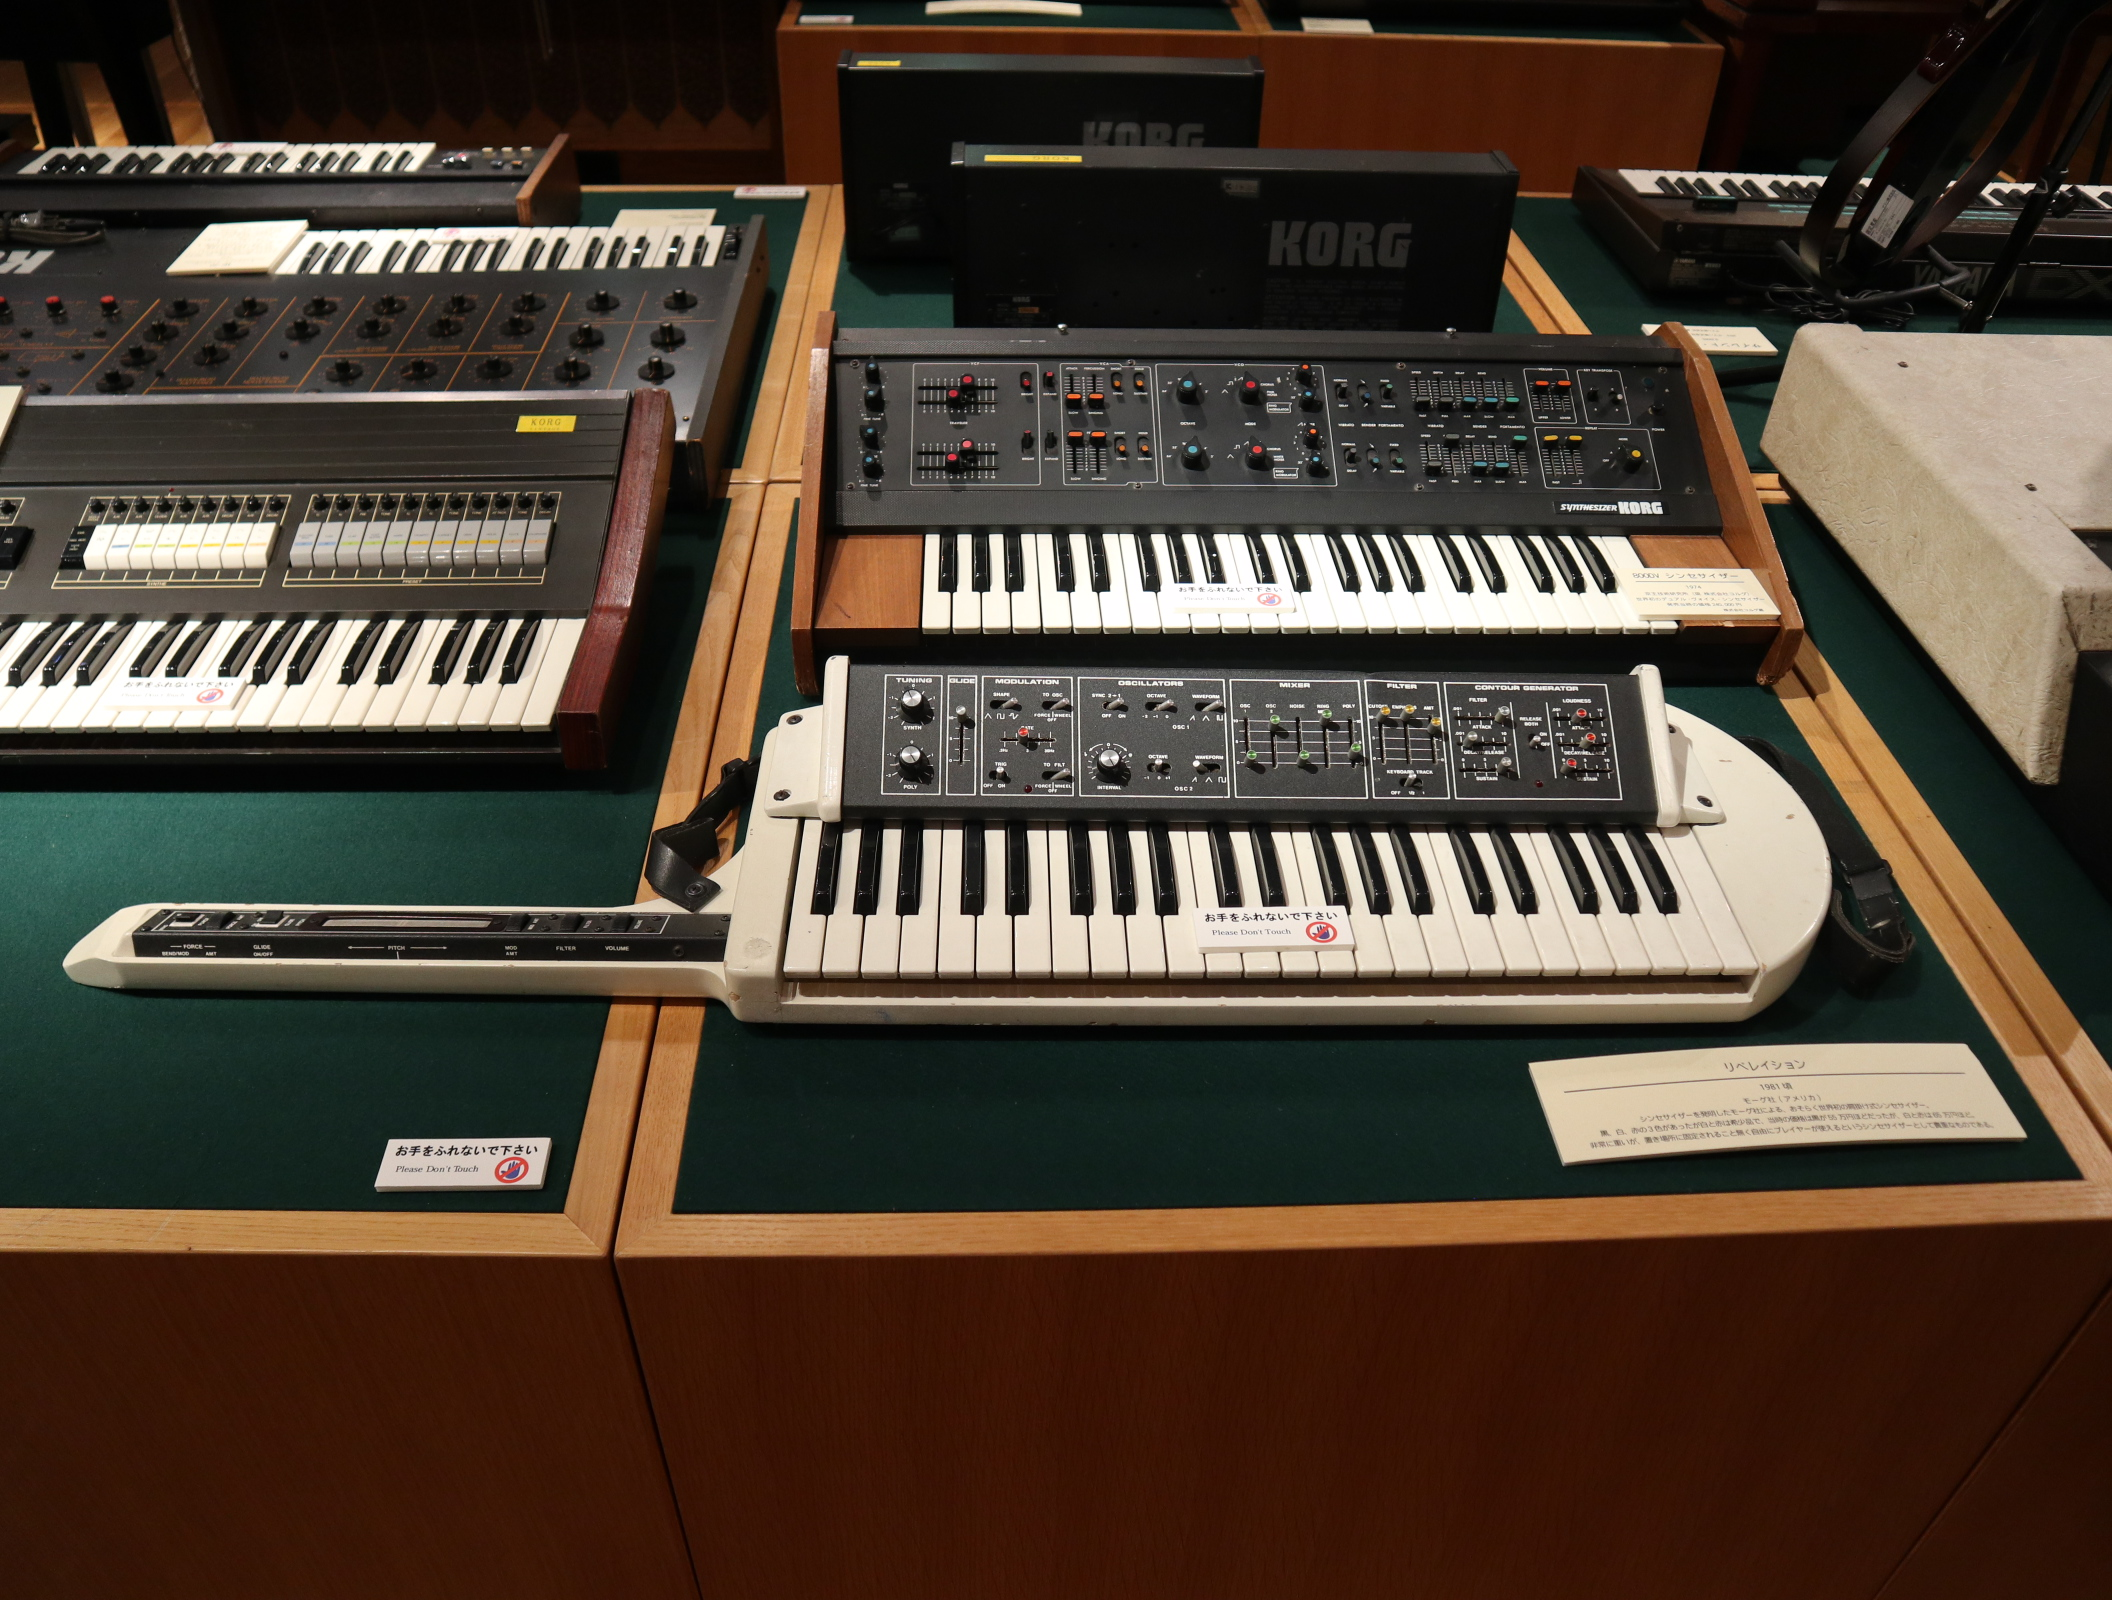 Moog Liberation (front) and Korg Maxi-Korg 800DV (rear)